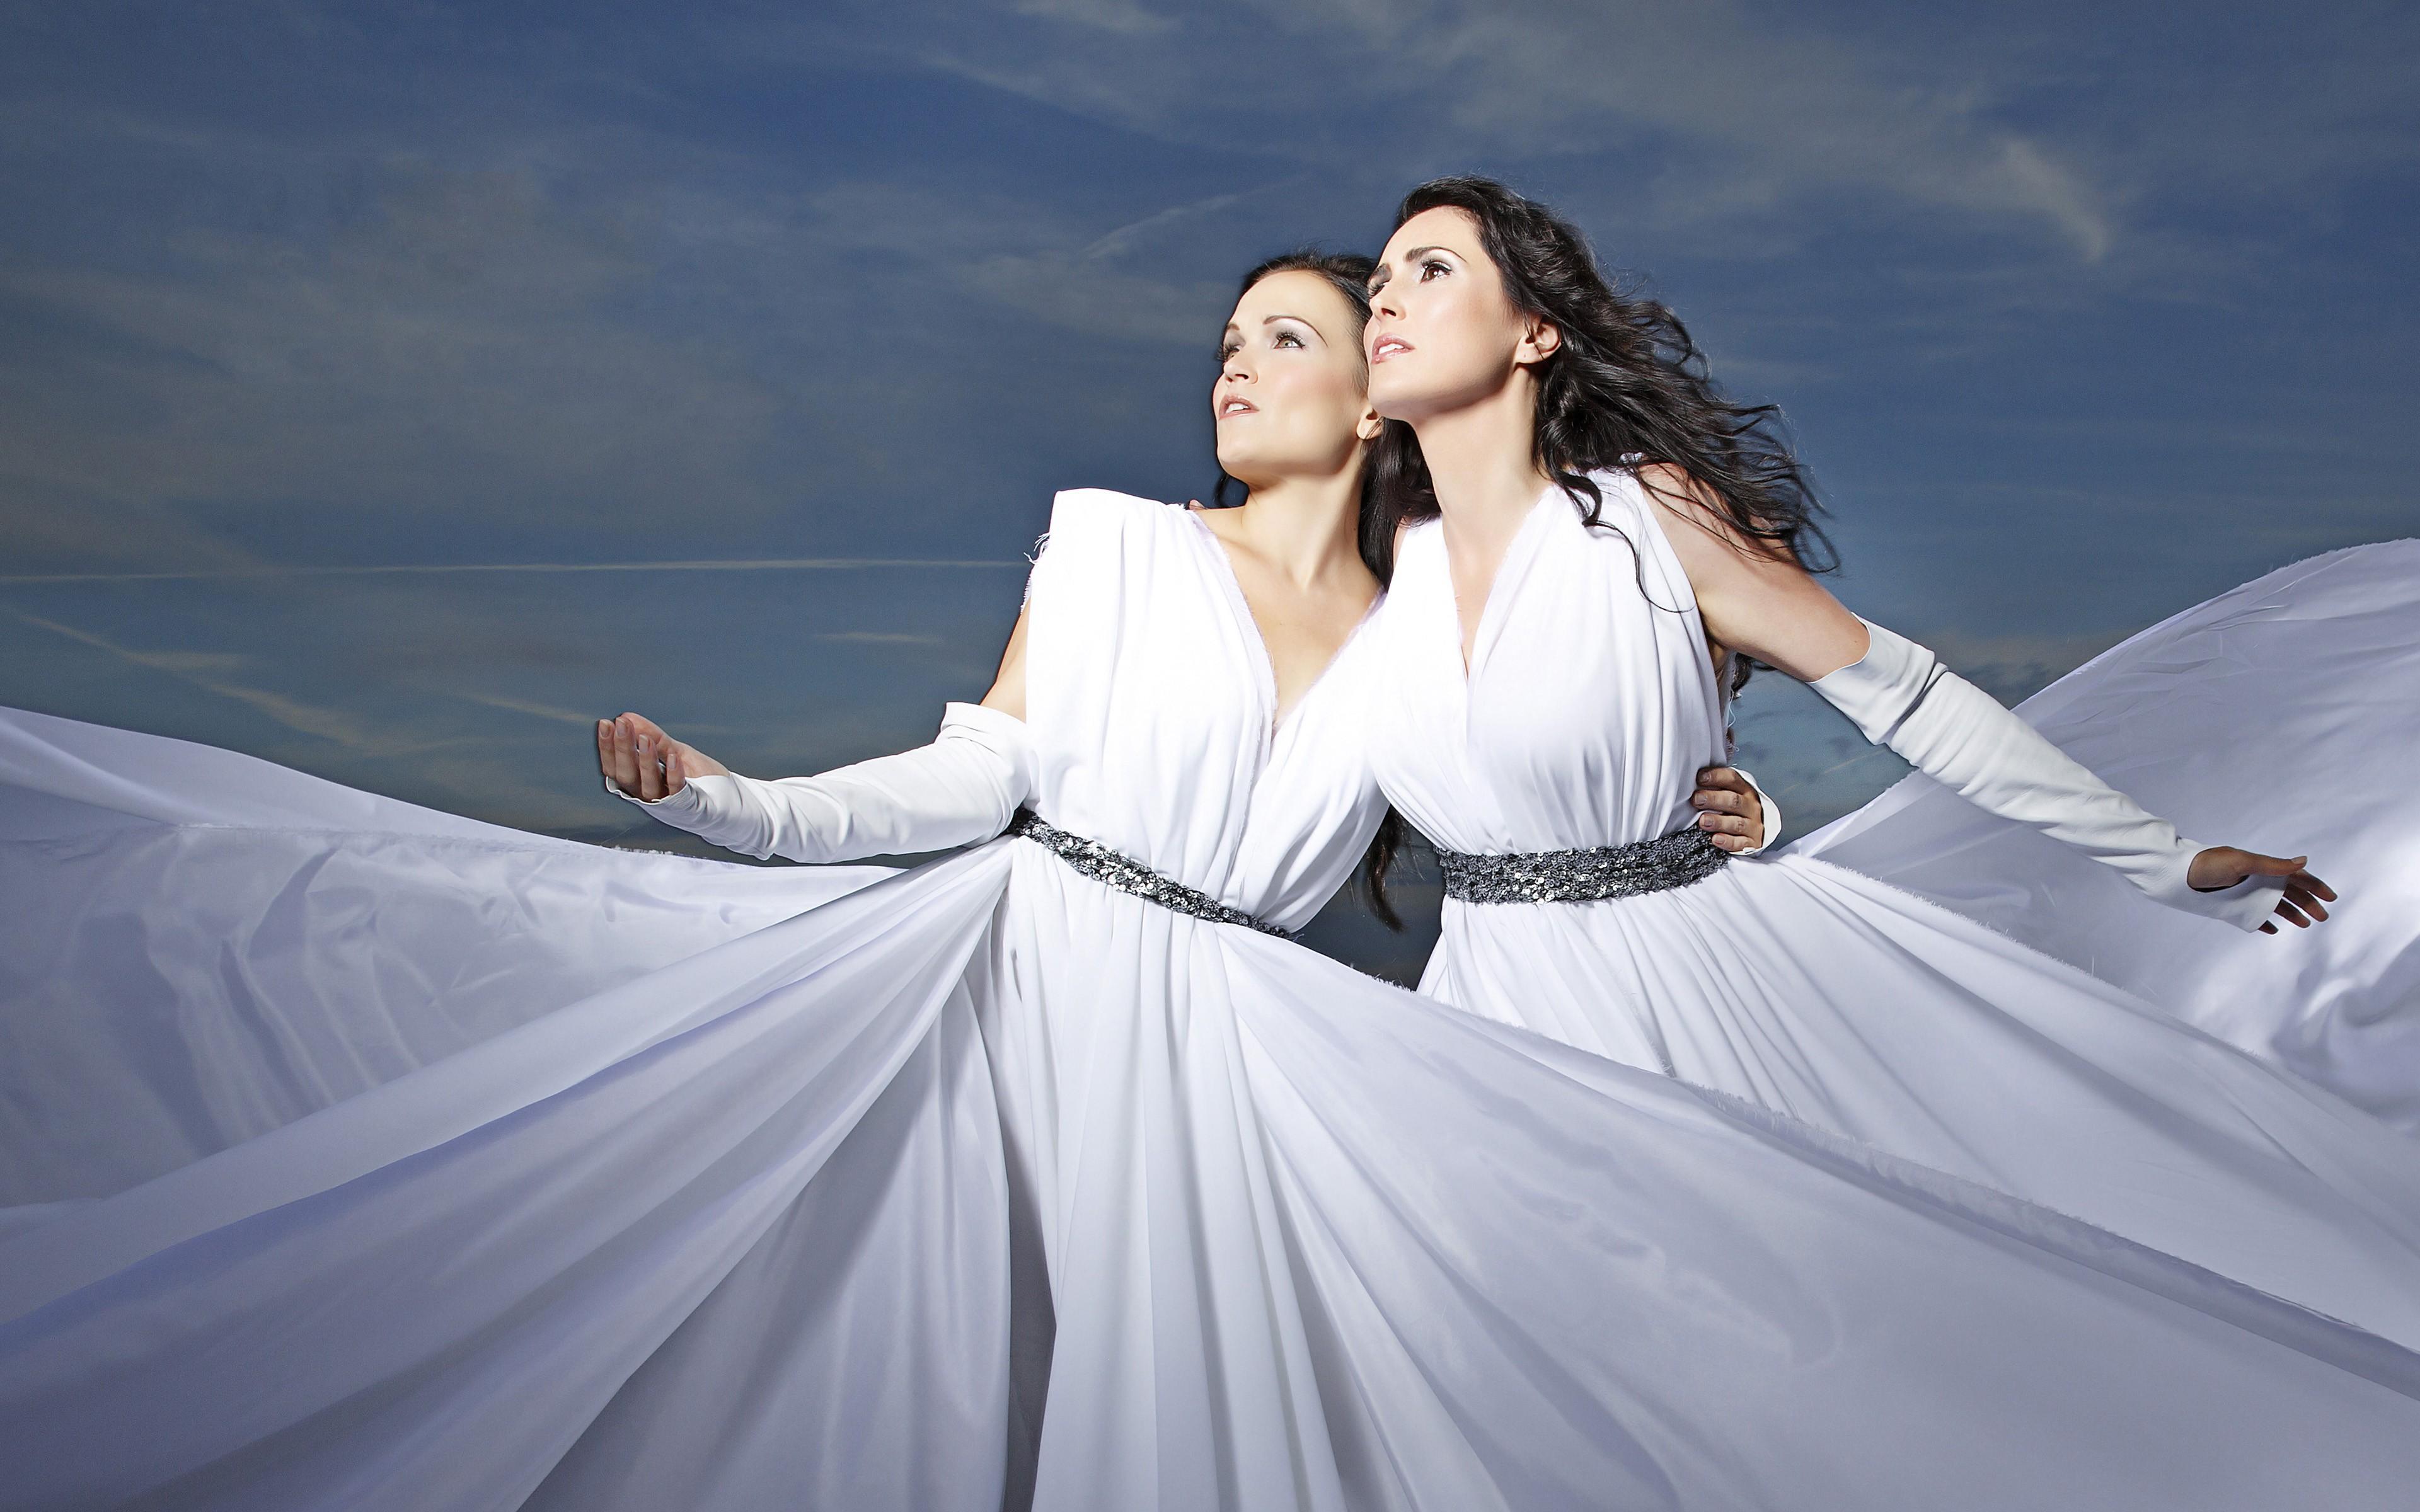 d8de40e9ff72 Kvinder fotografering sanger kjole bryllupskjole romantik symfonisk metal  Sharon den Adel Tarja Turunen kvinde brud fotografi